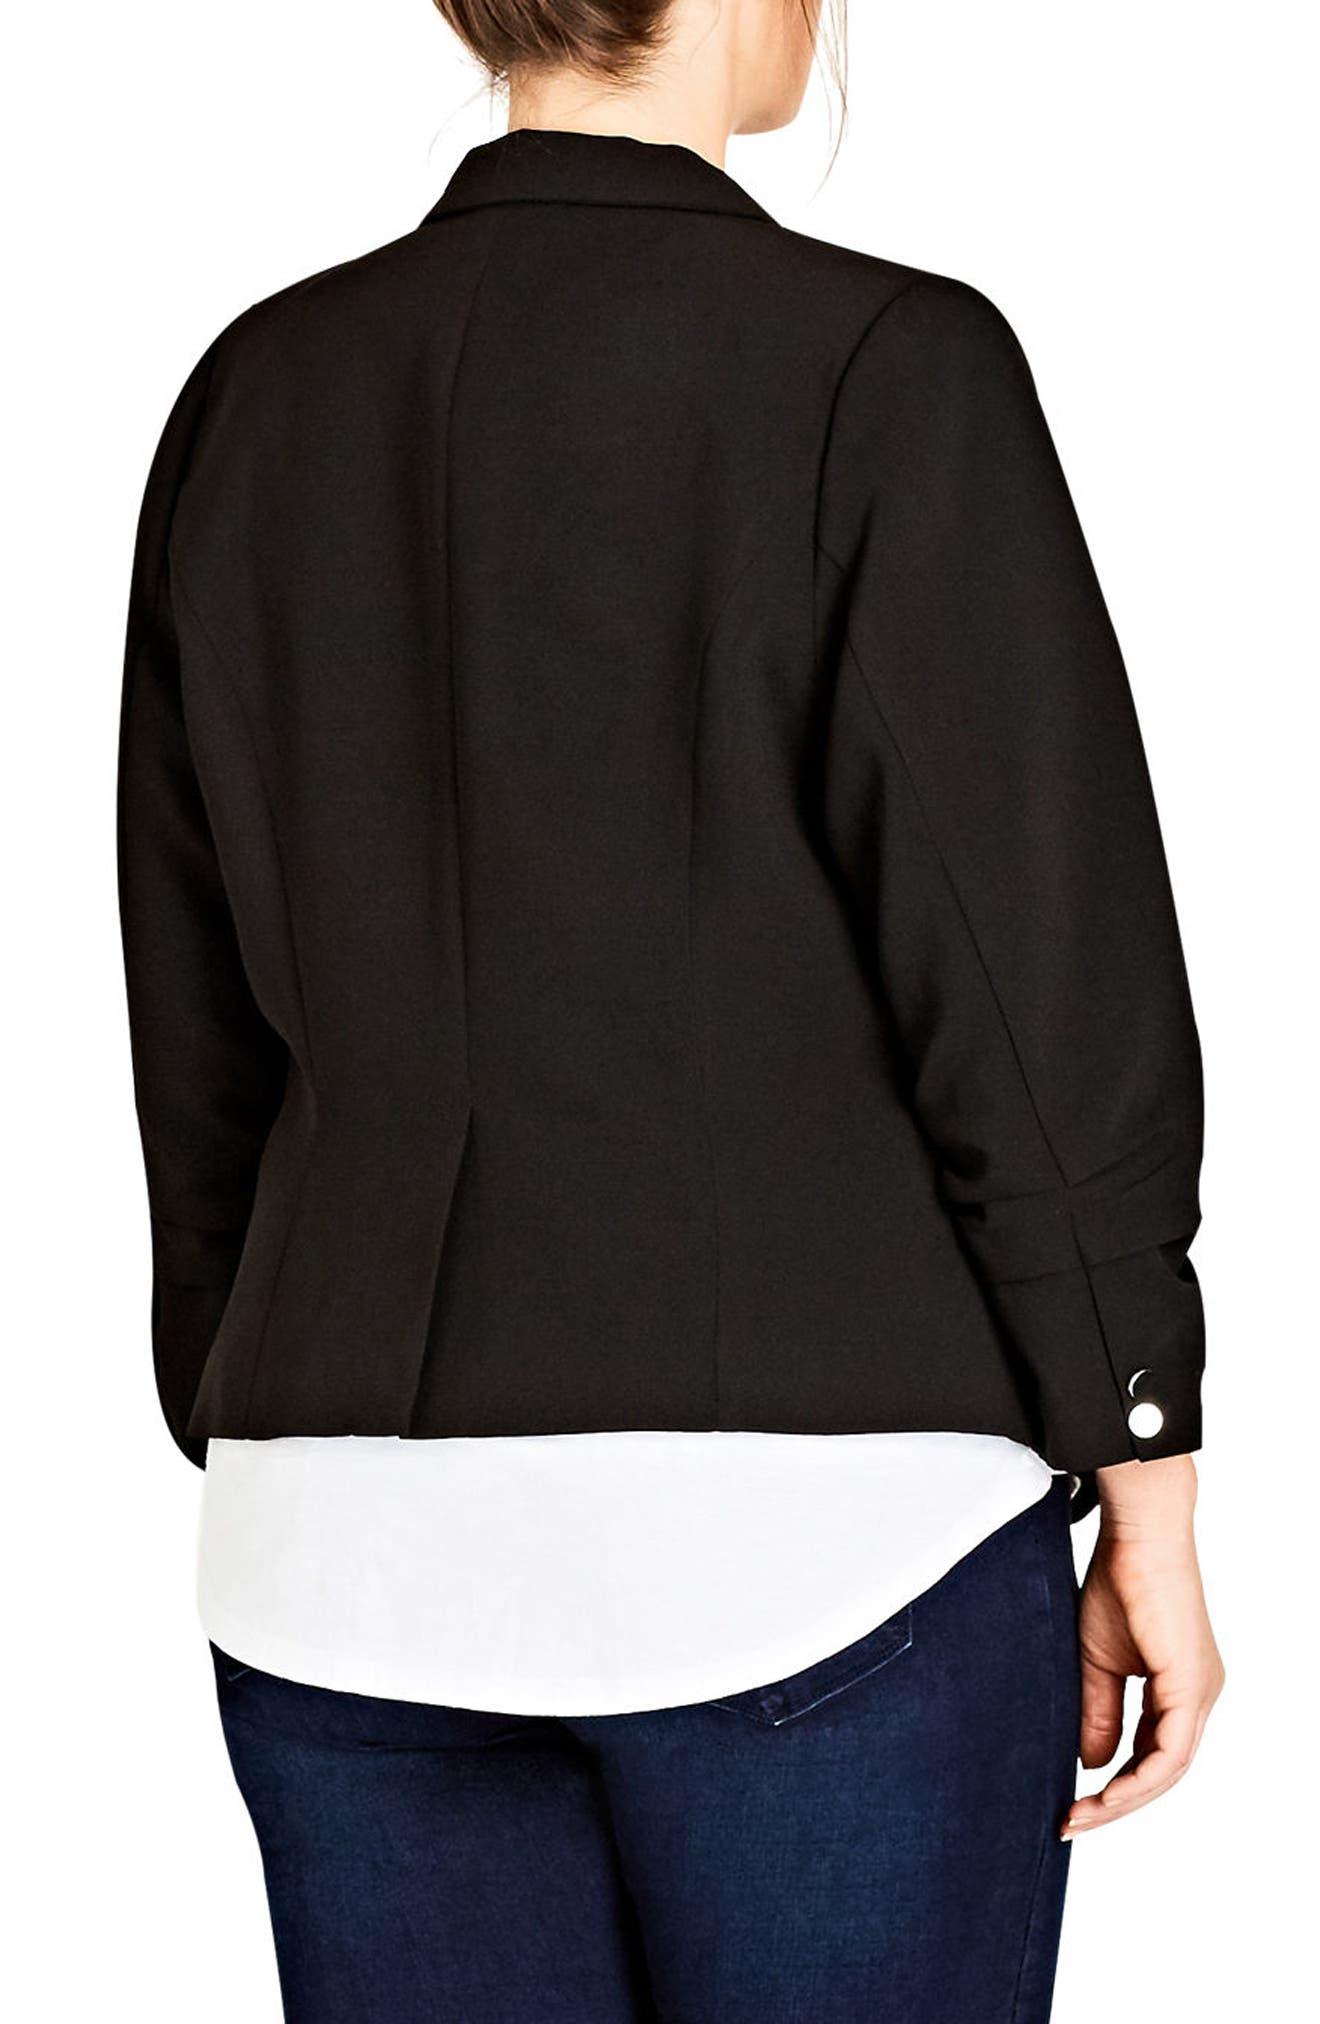 Classy Lady Jacket,                             Alternate thumbnail 2, color,                             Black